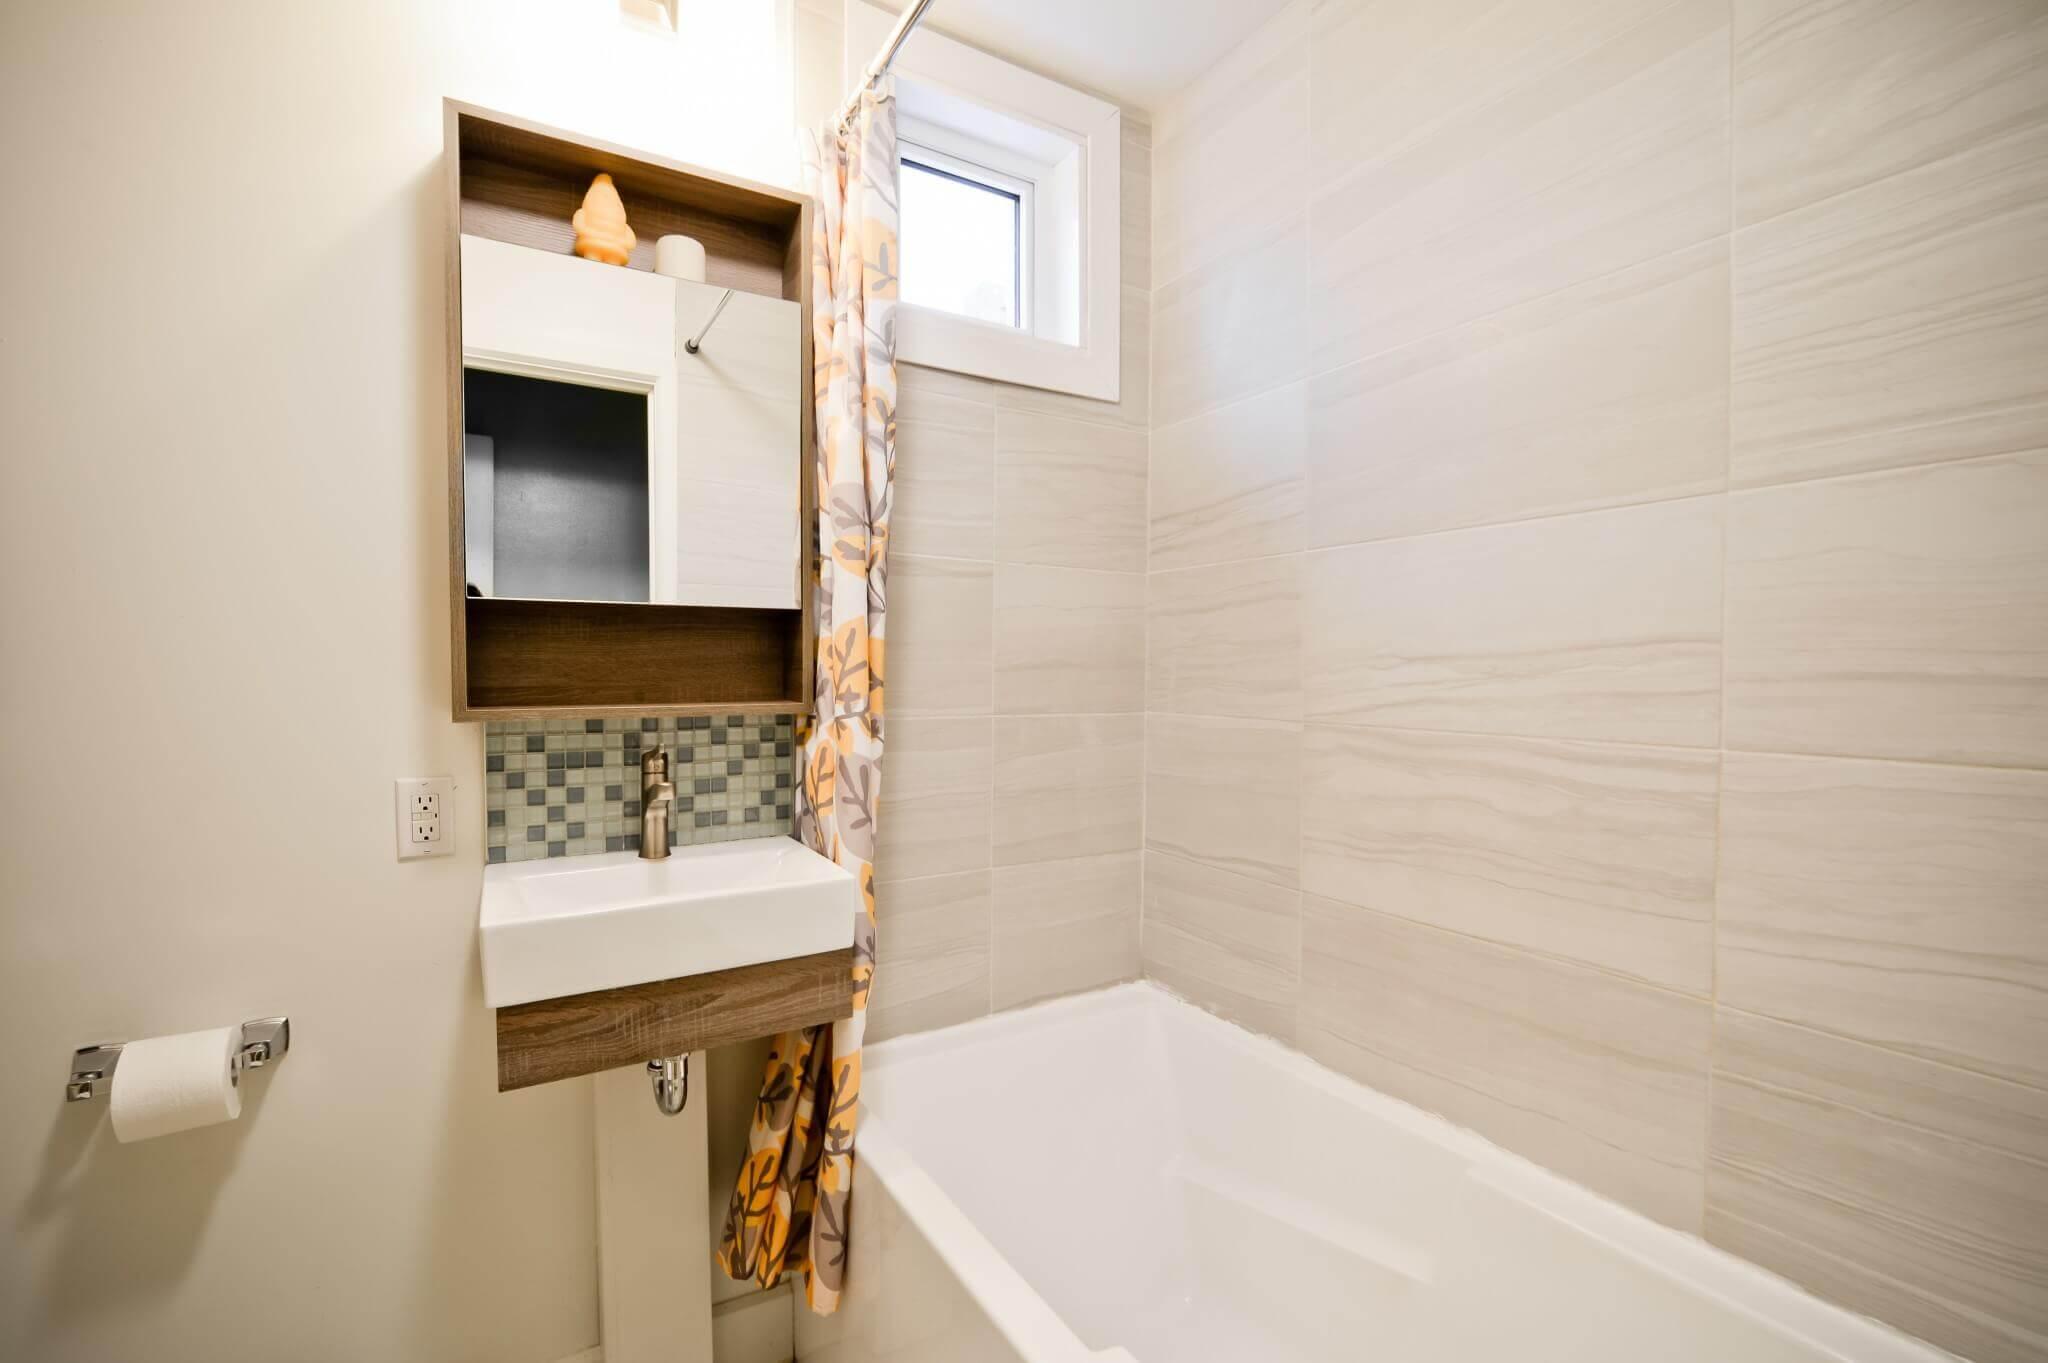 petite salle de bain apres renovation